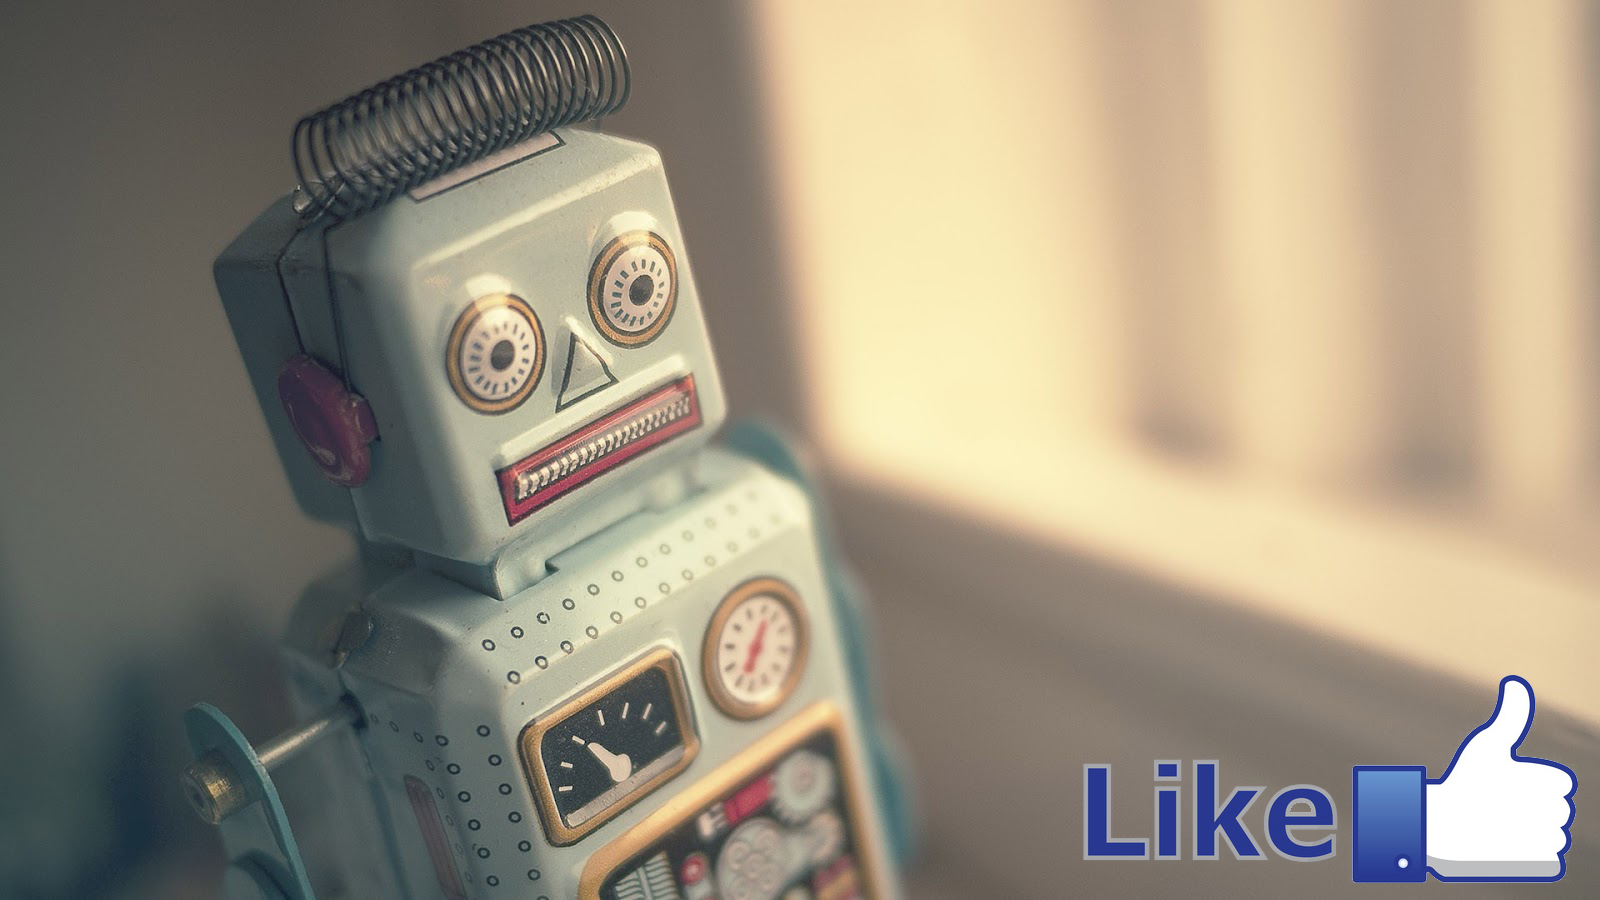 vintage-robot-desktop-wallpaperlike.jpg